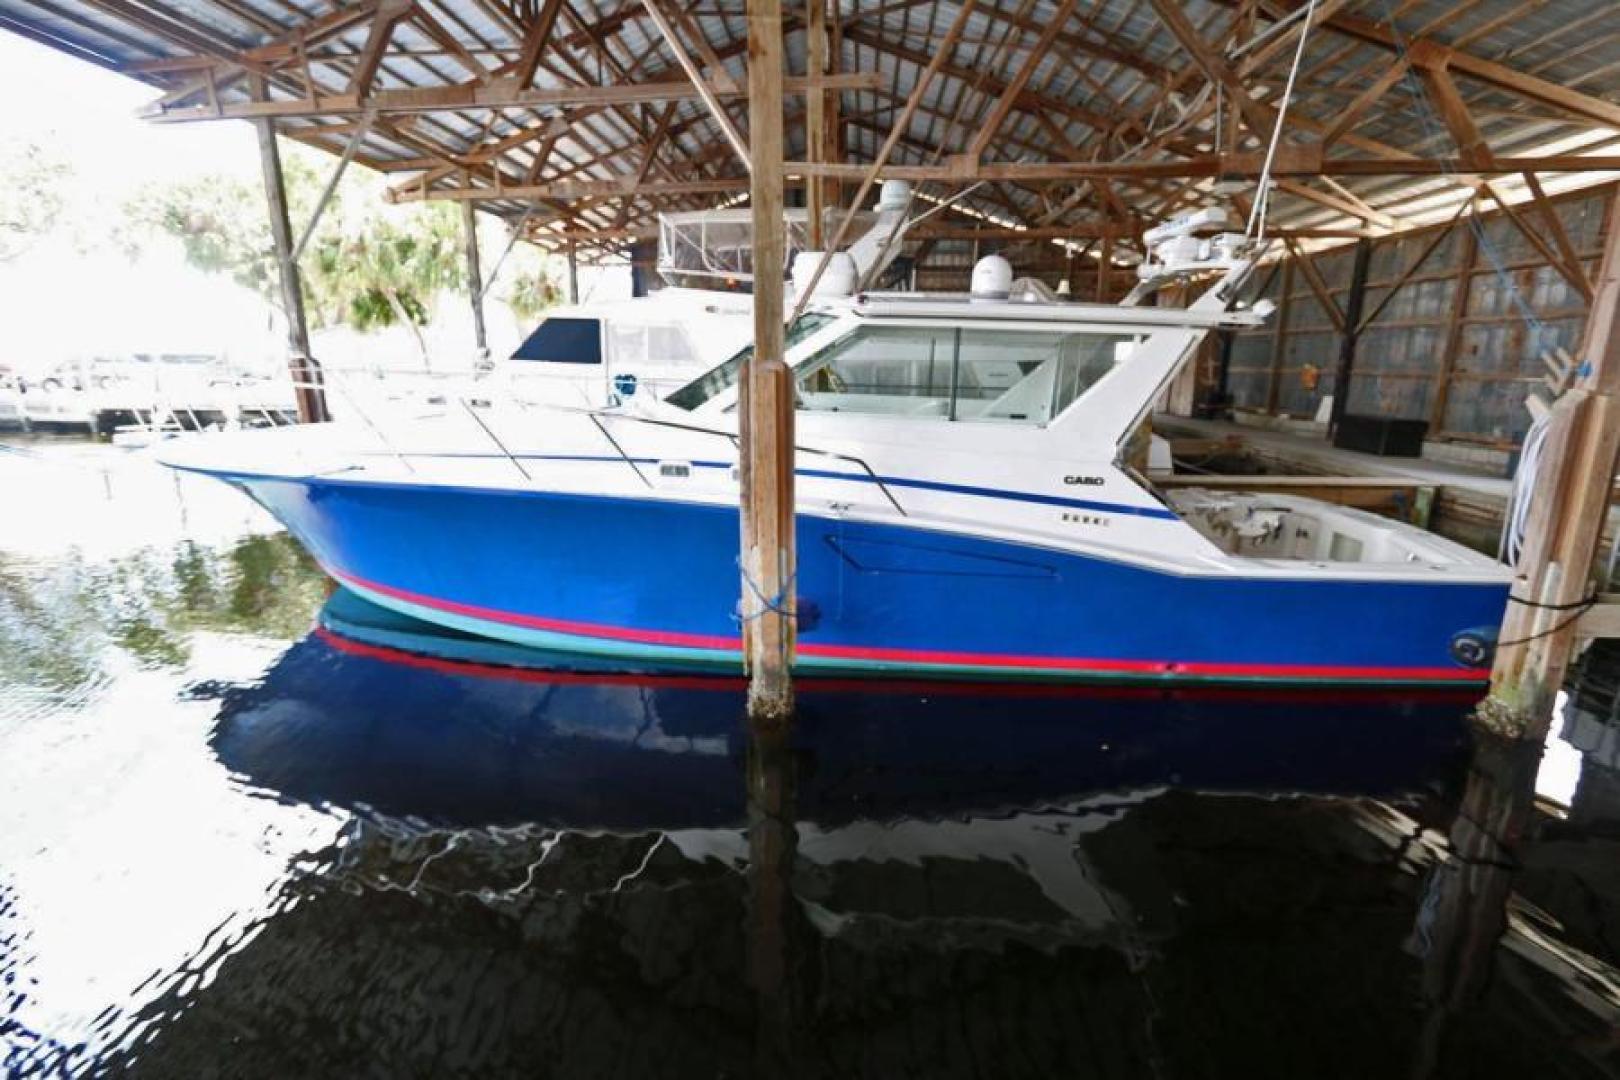 Cabo-45 Express 1997-Reel Life Panama City Beach-Florida-United States-1997 45 Cabo Express-1368076   Thumbnail